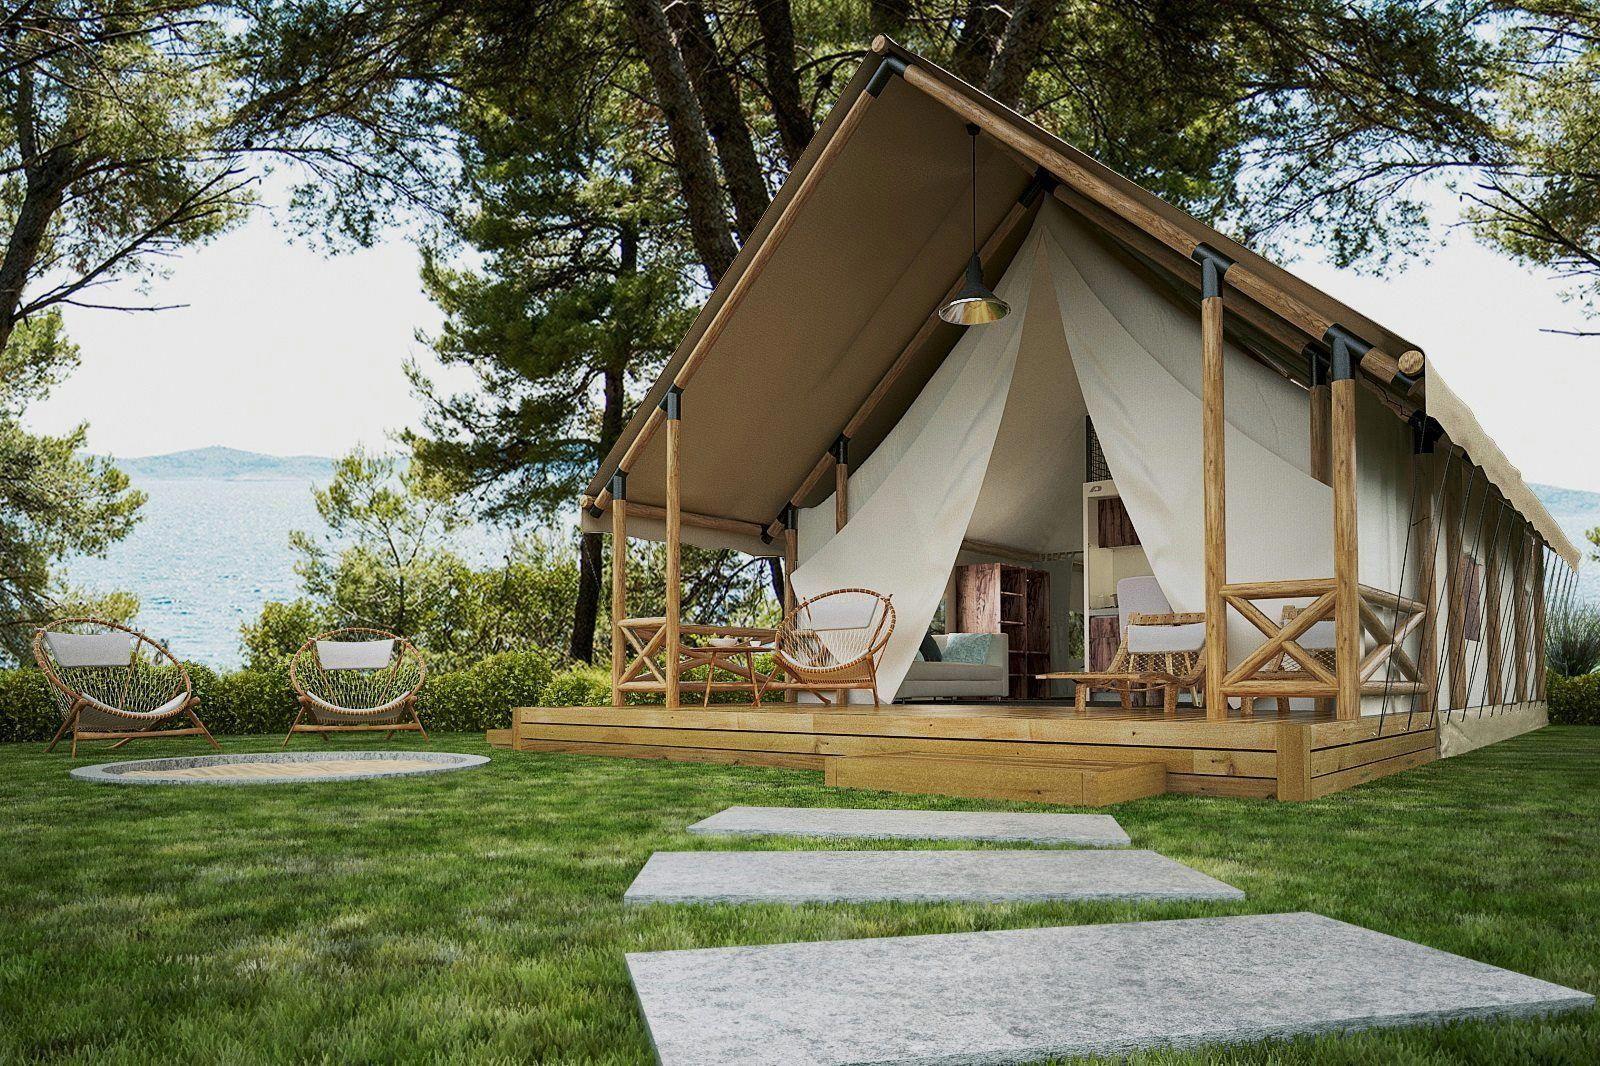 Camping Usa   Glamping resorts, Tent glamping, Tent living